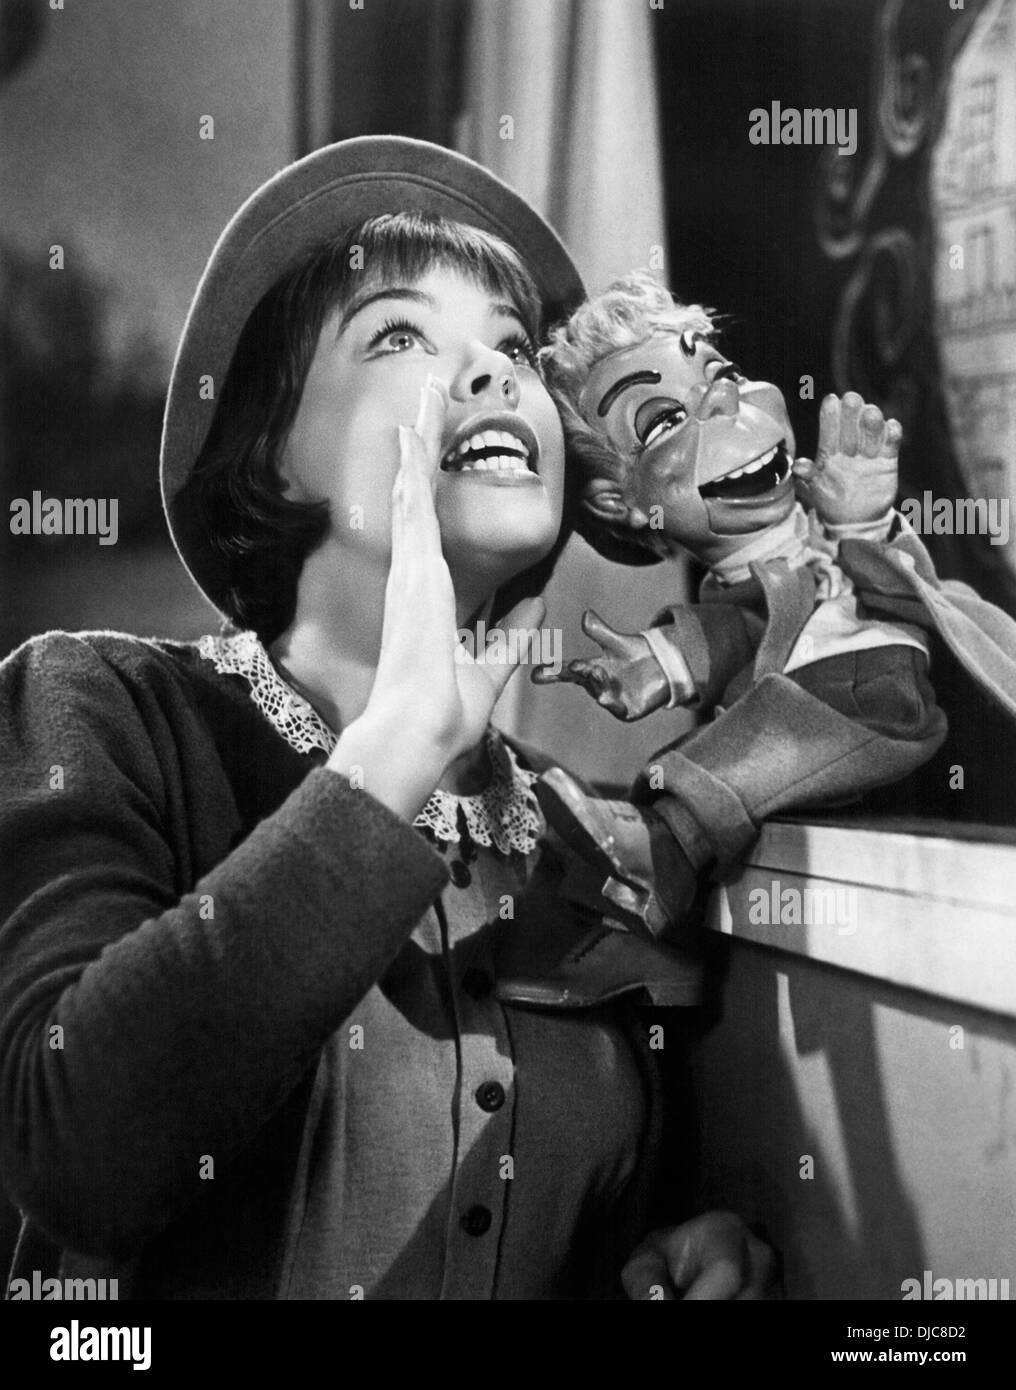 Leslie Caron on-set of the Film, Lili, 1953 - Stock Image